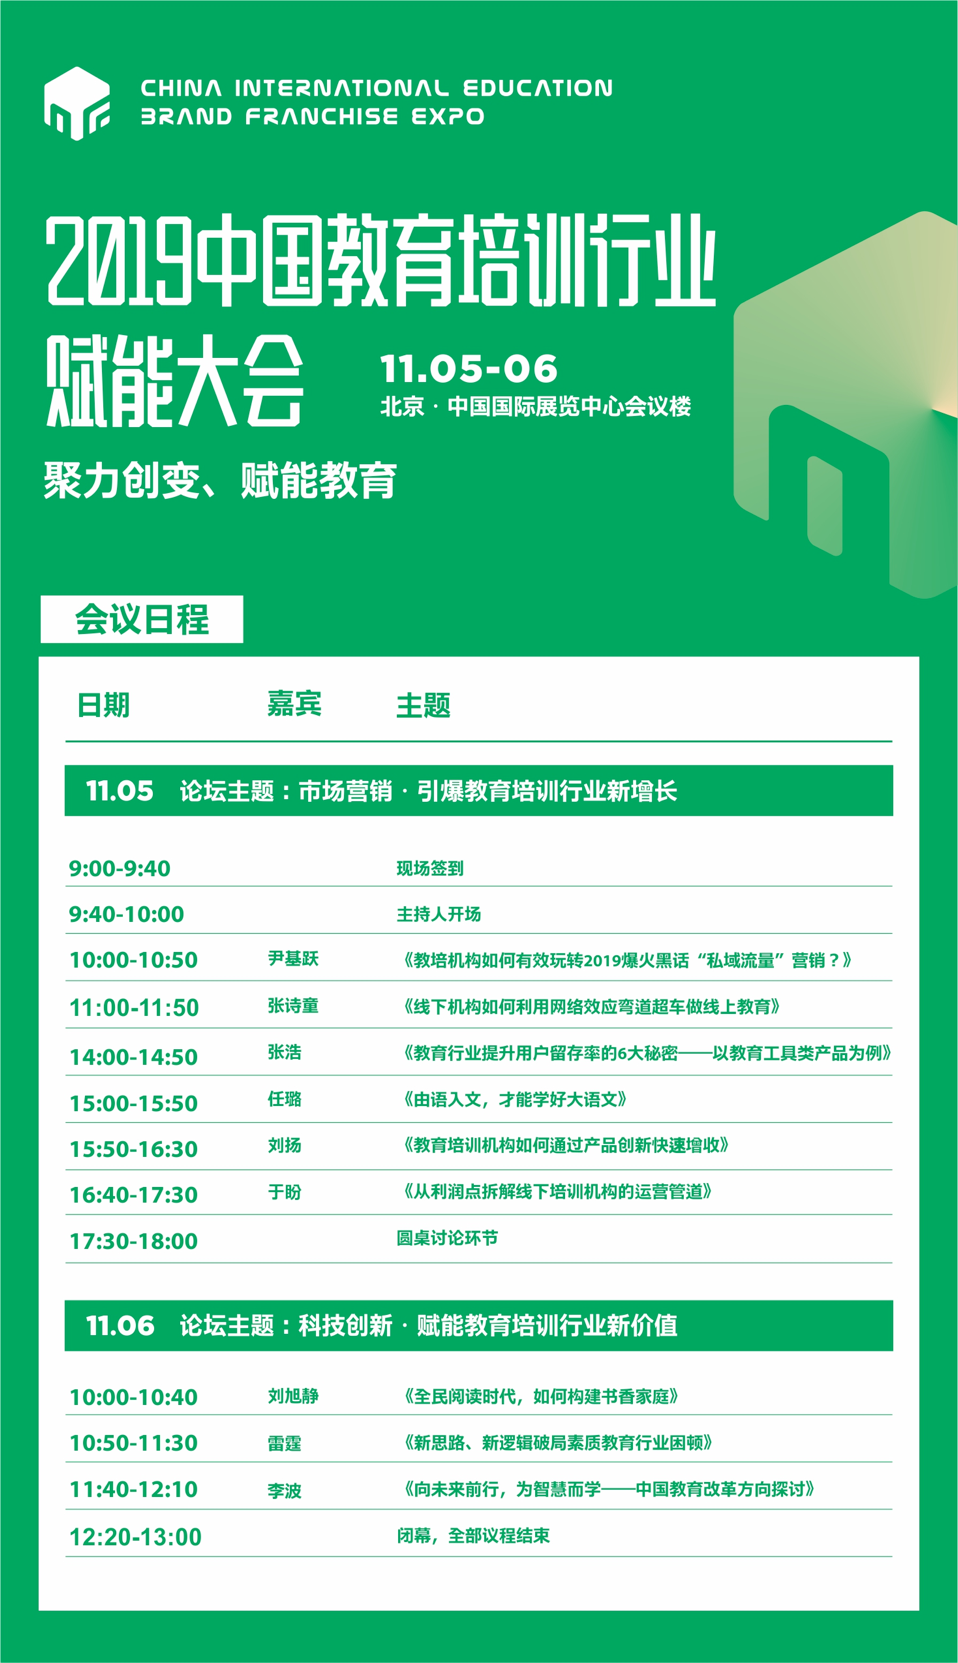 CEF 2019第十三届中国国际教育品